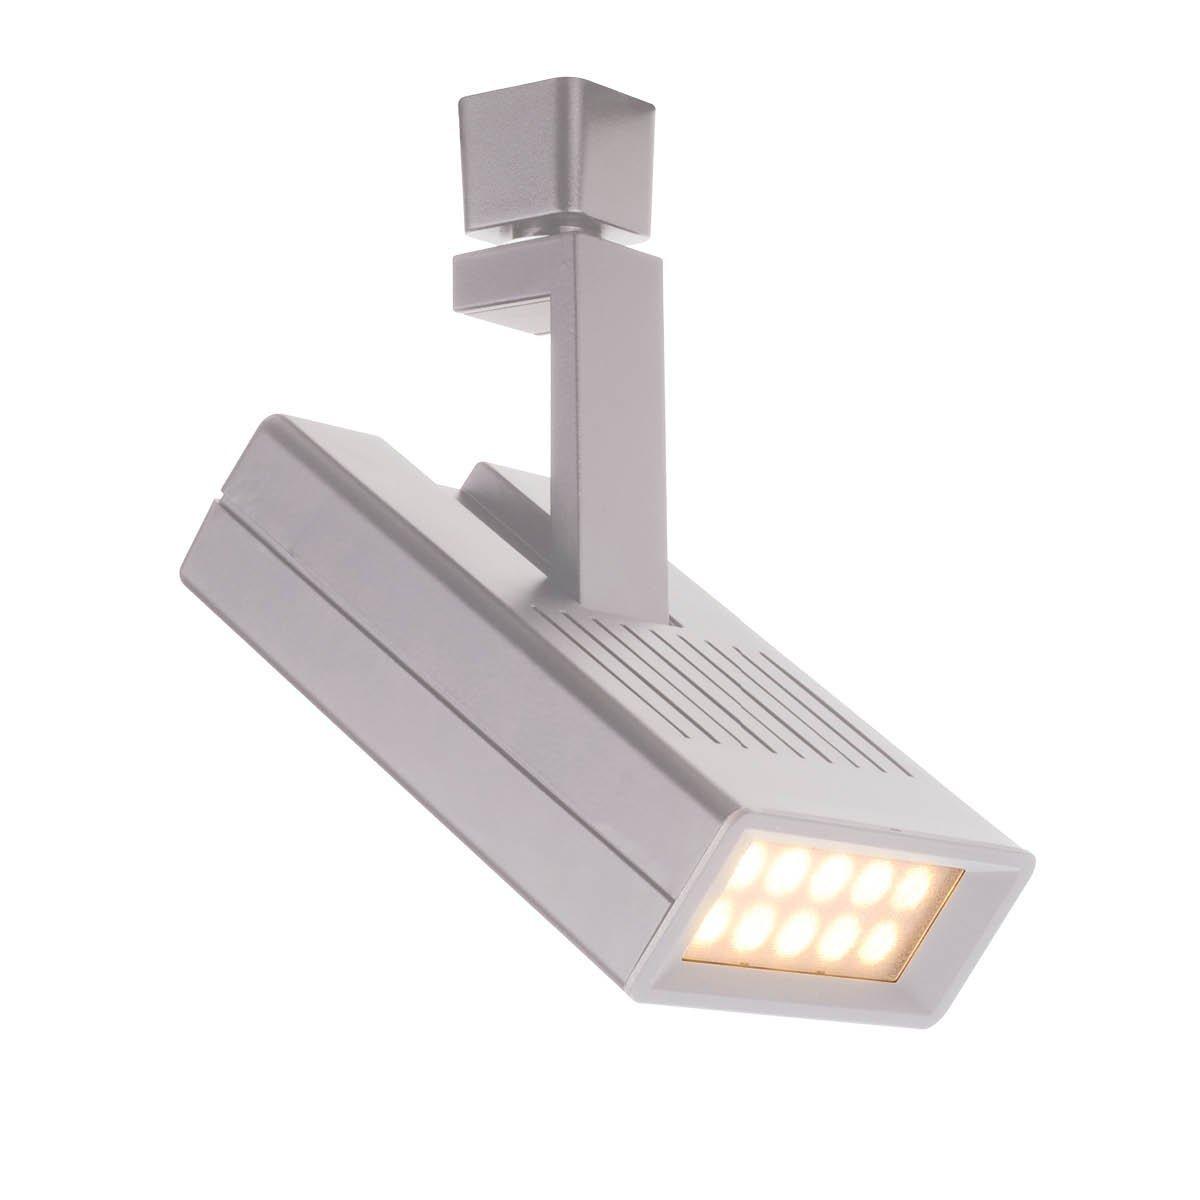 WAC Lighting H-LED25S-30-WT Argos Energy Star LED Track Fixture, White